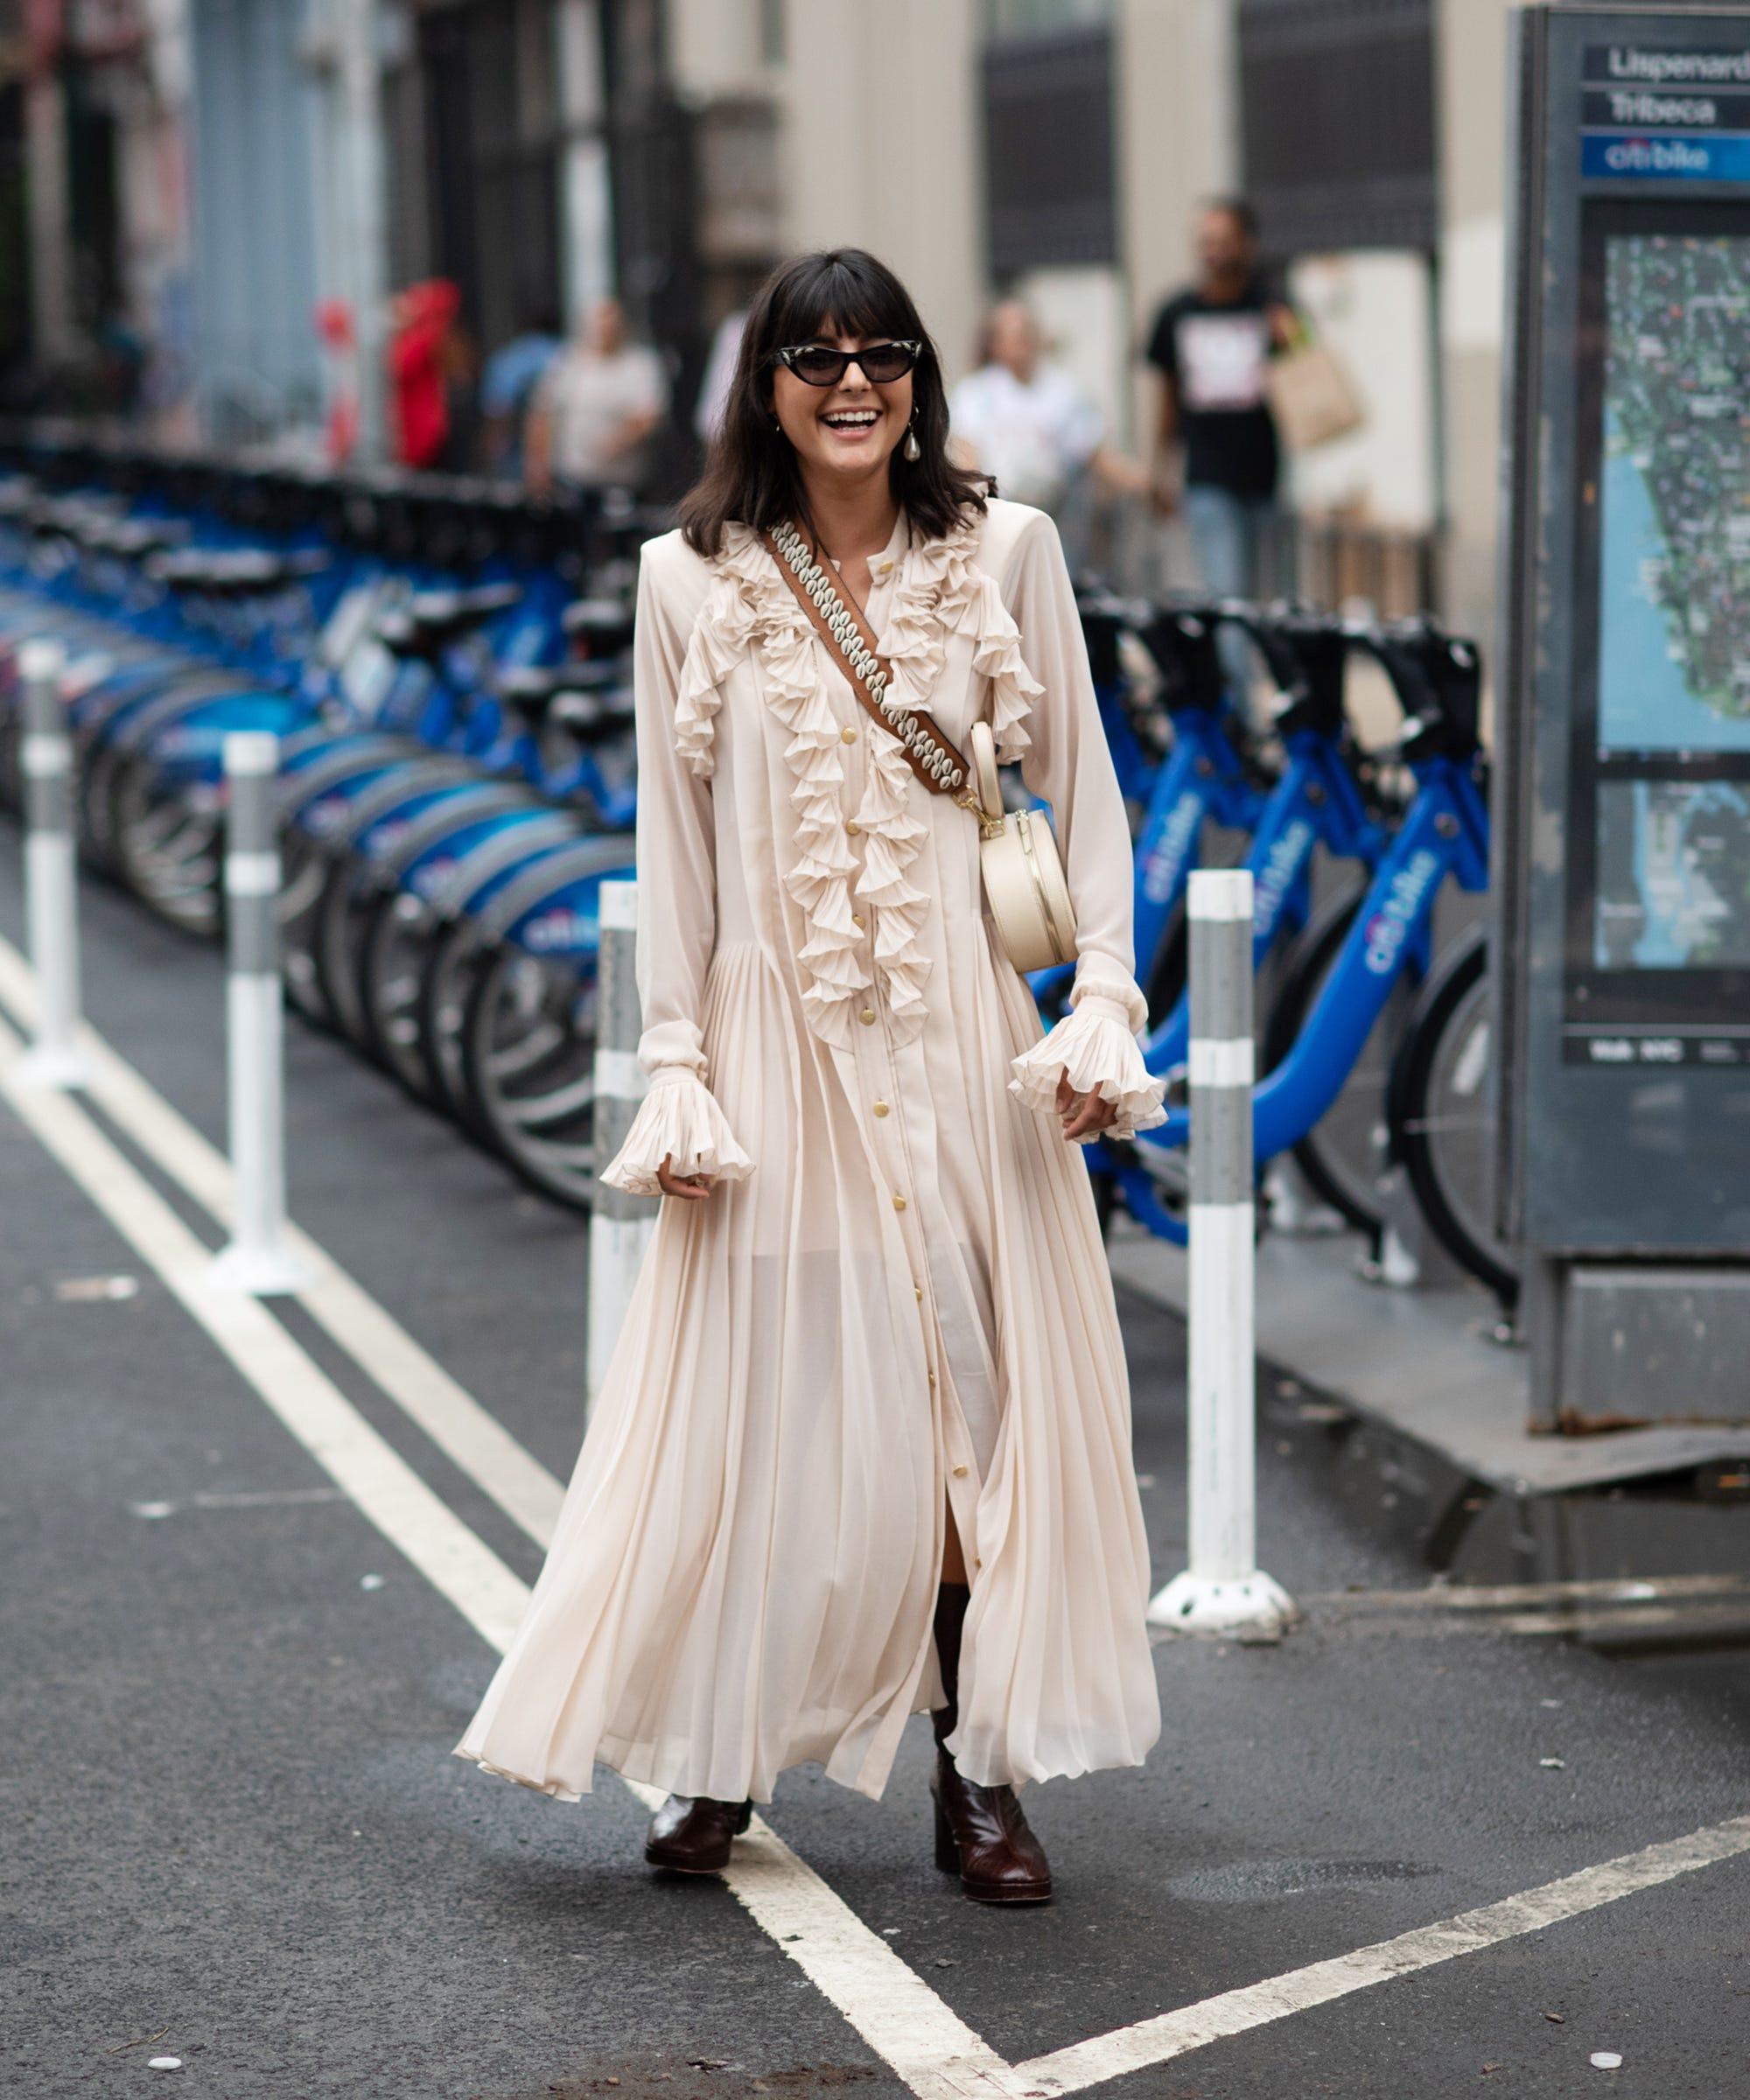 ec4732d6a New York Fashion Week Spring Summer 2019 Street Style